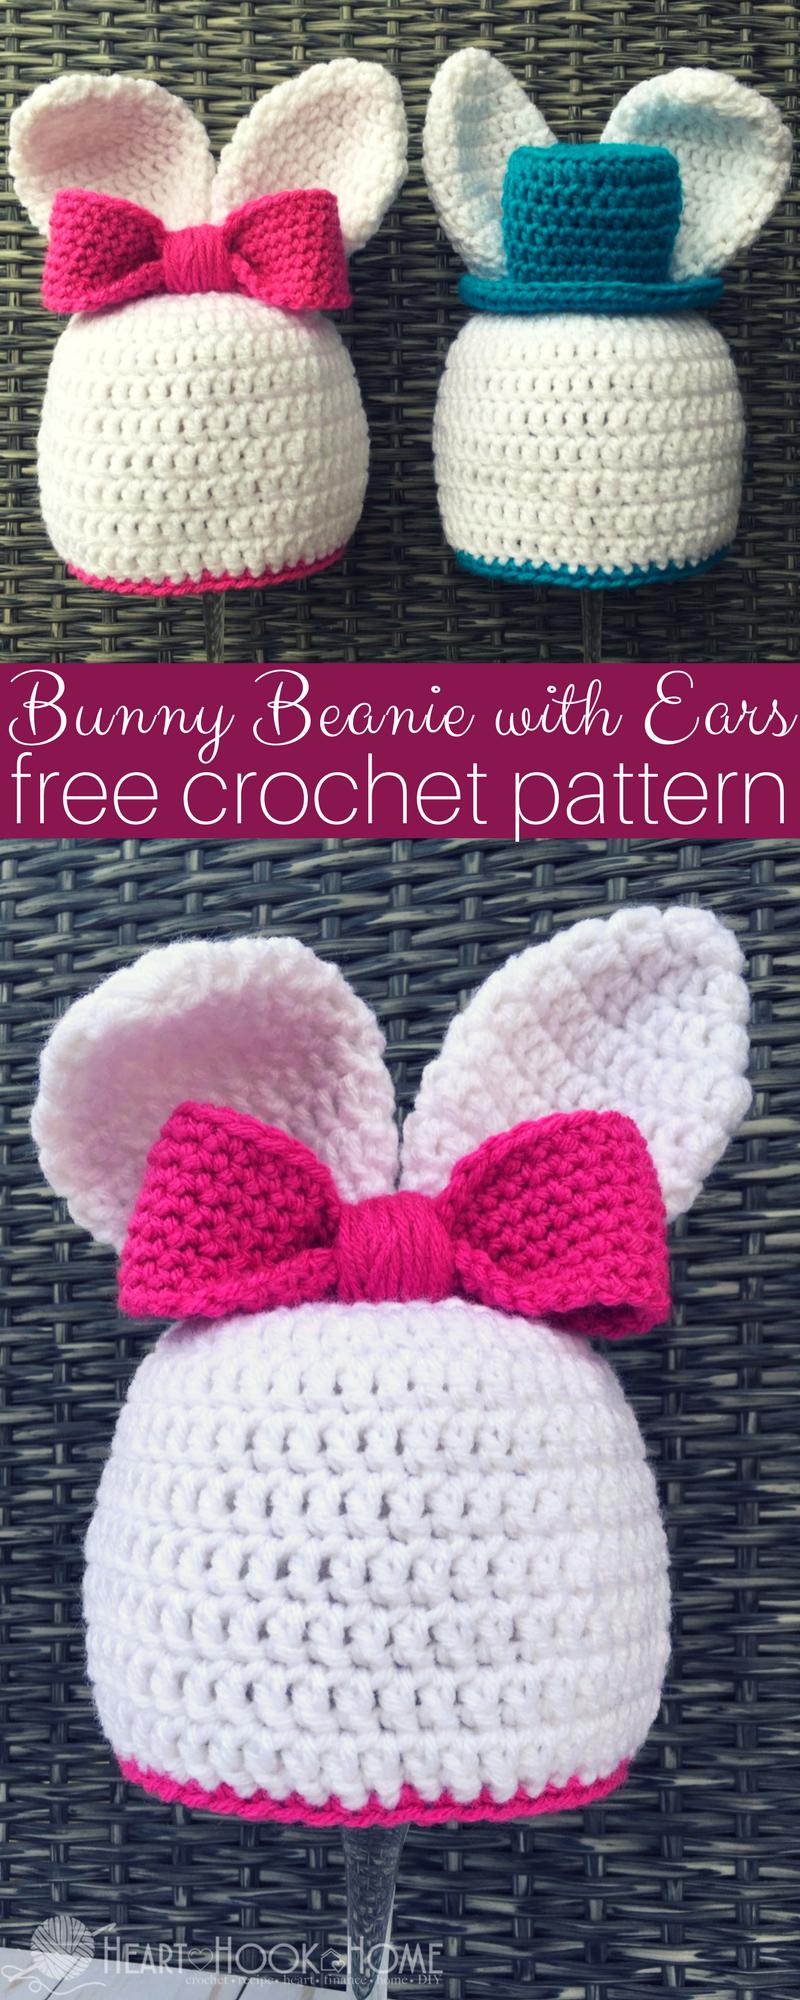 Bunny Beanie With Ears Free Crochet Pattern For Easter Crochet Hats Easter Crochet Crochet For Boys